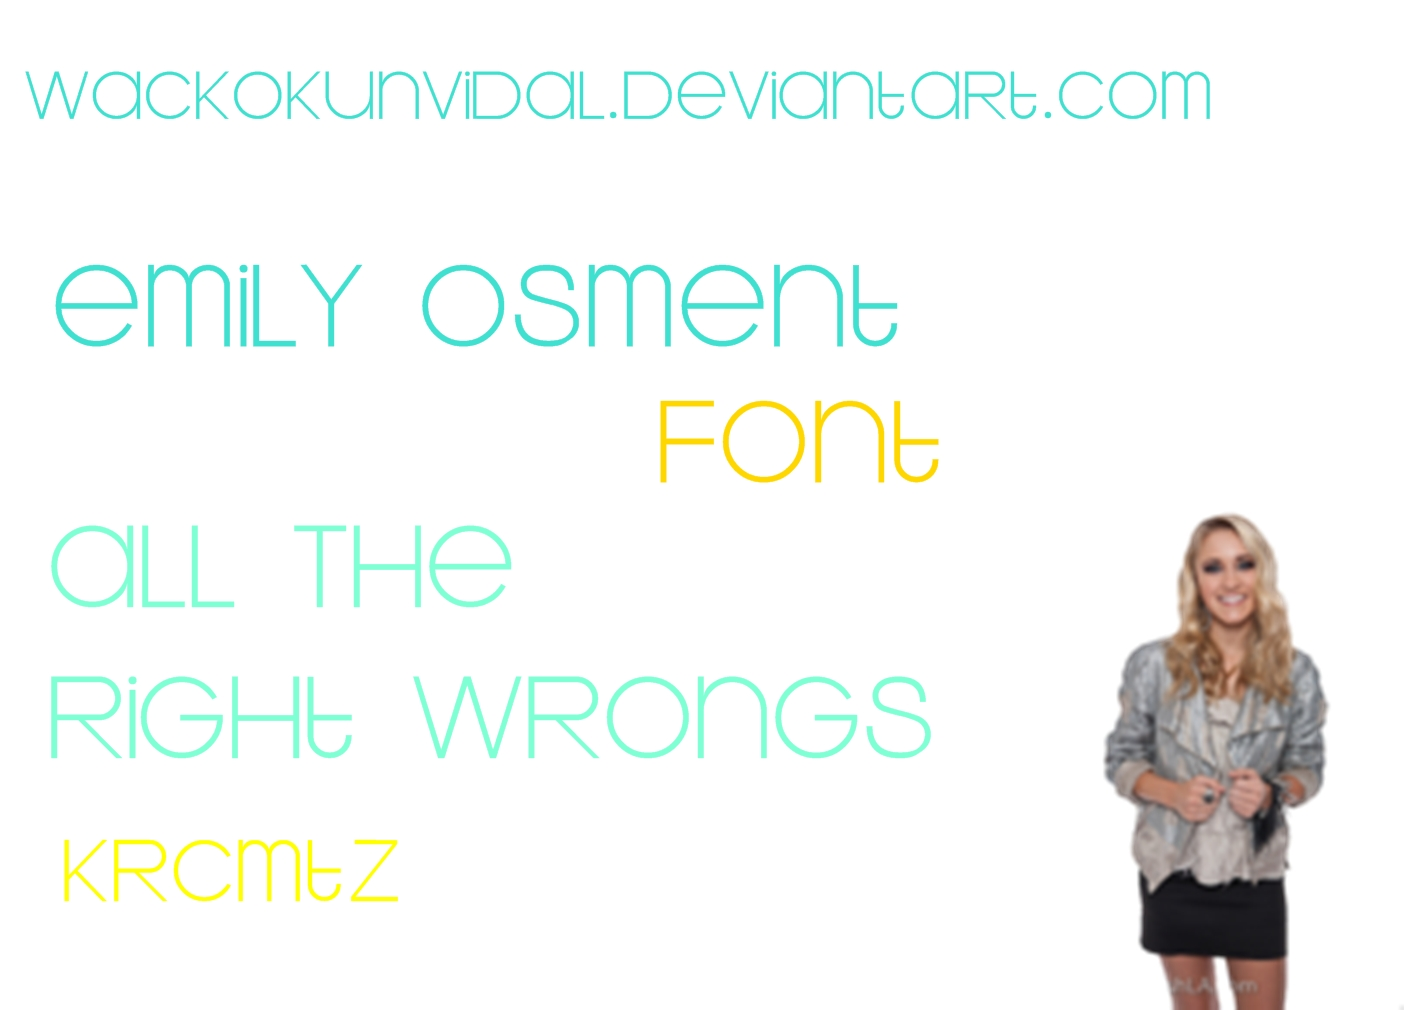 Emily Osment FONT